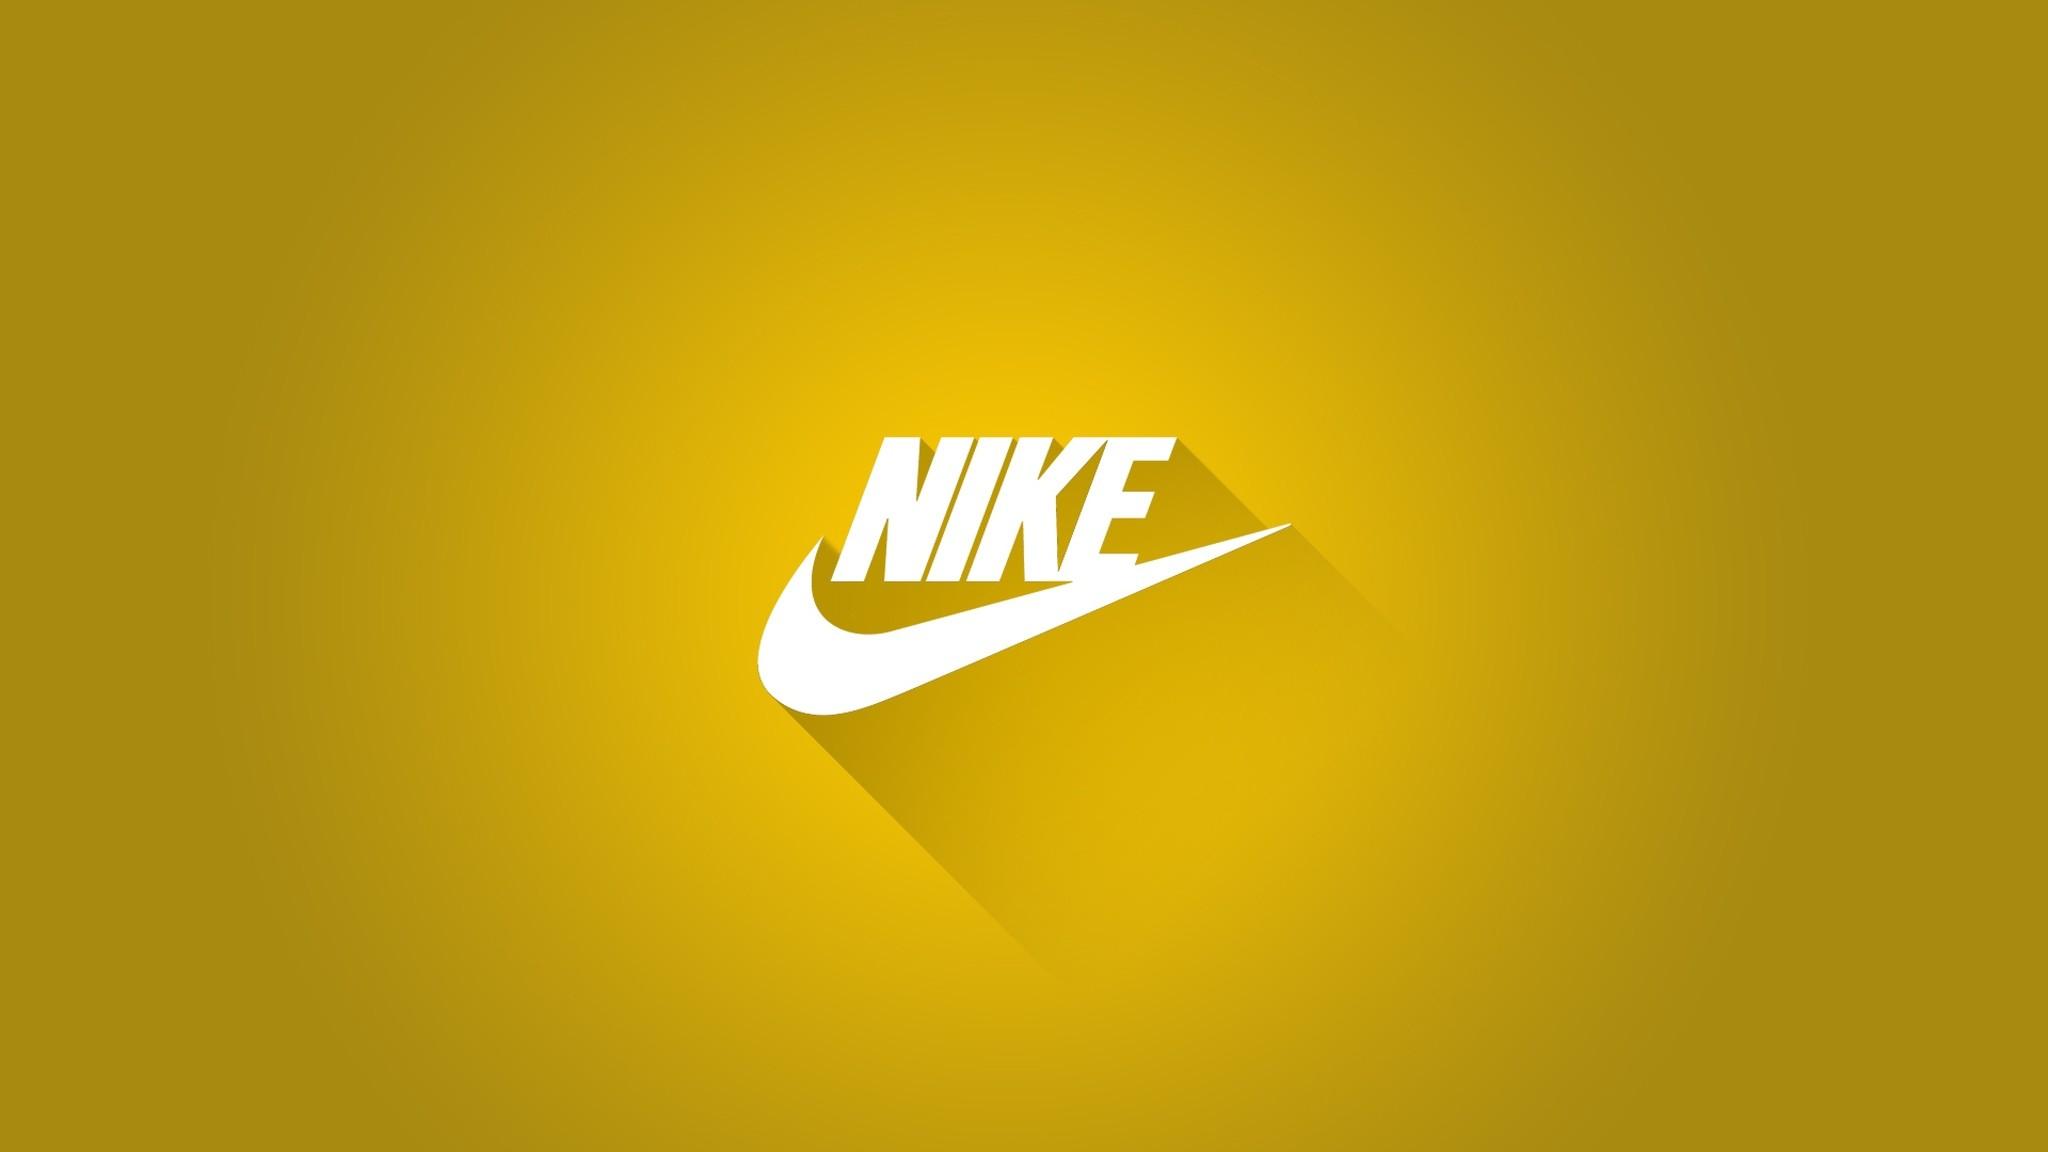 Res: 2048x1152, nike-logo.jpg